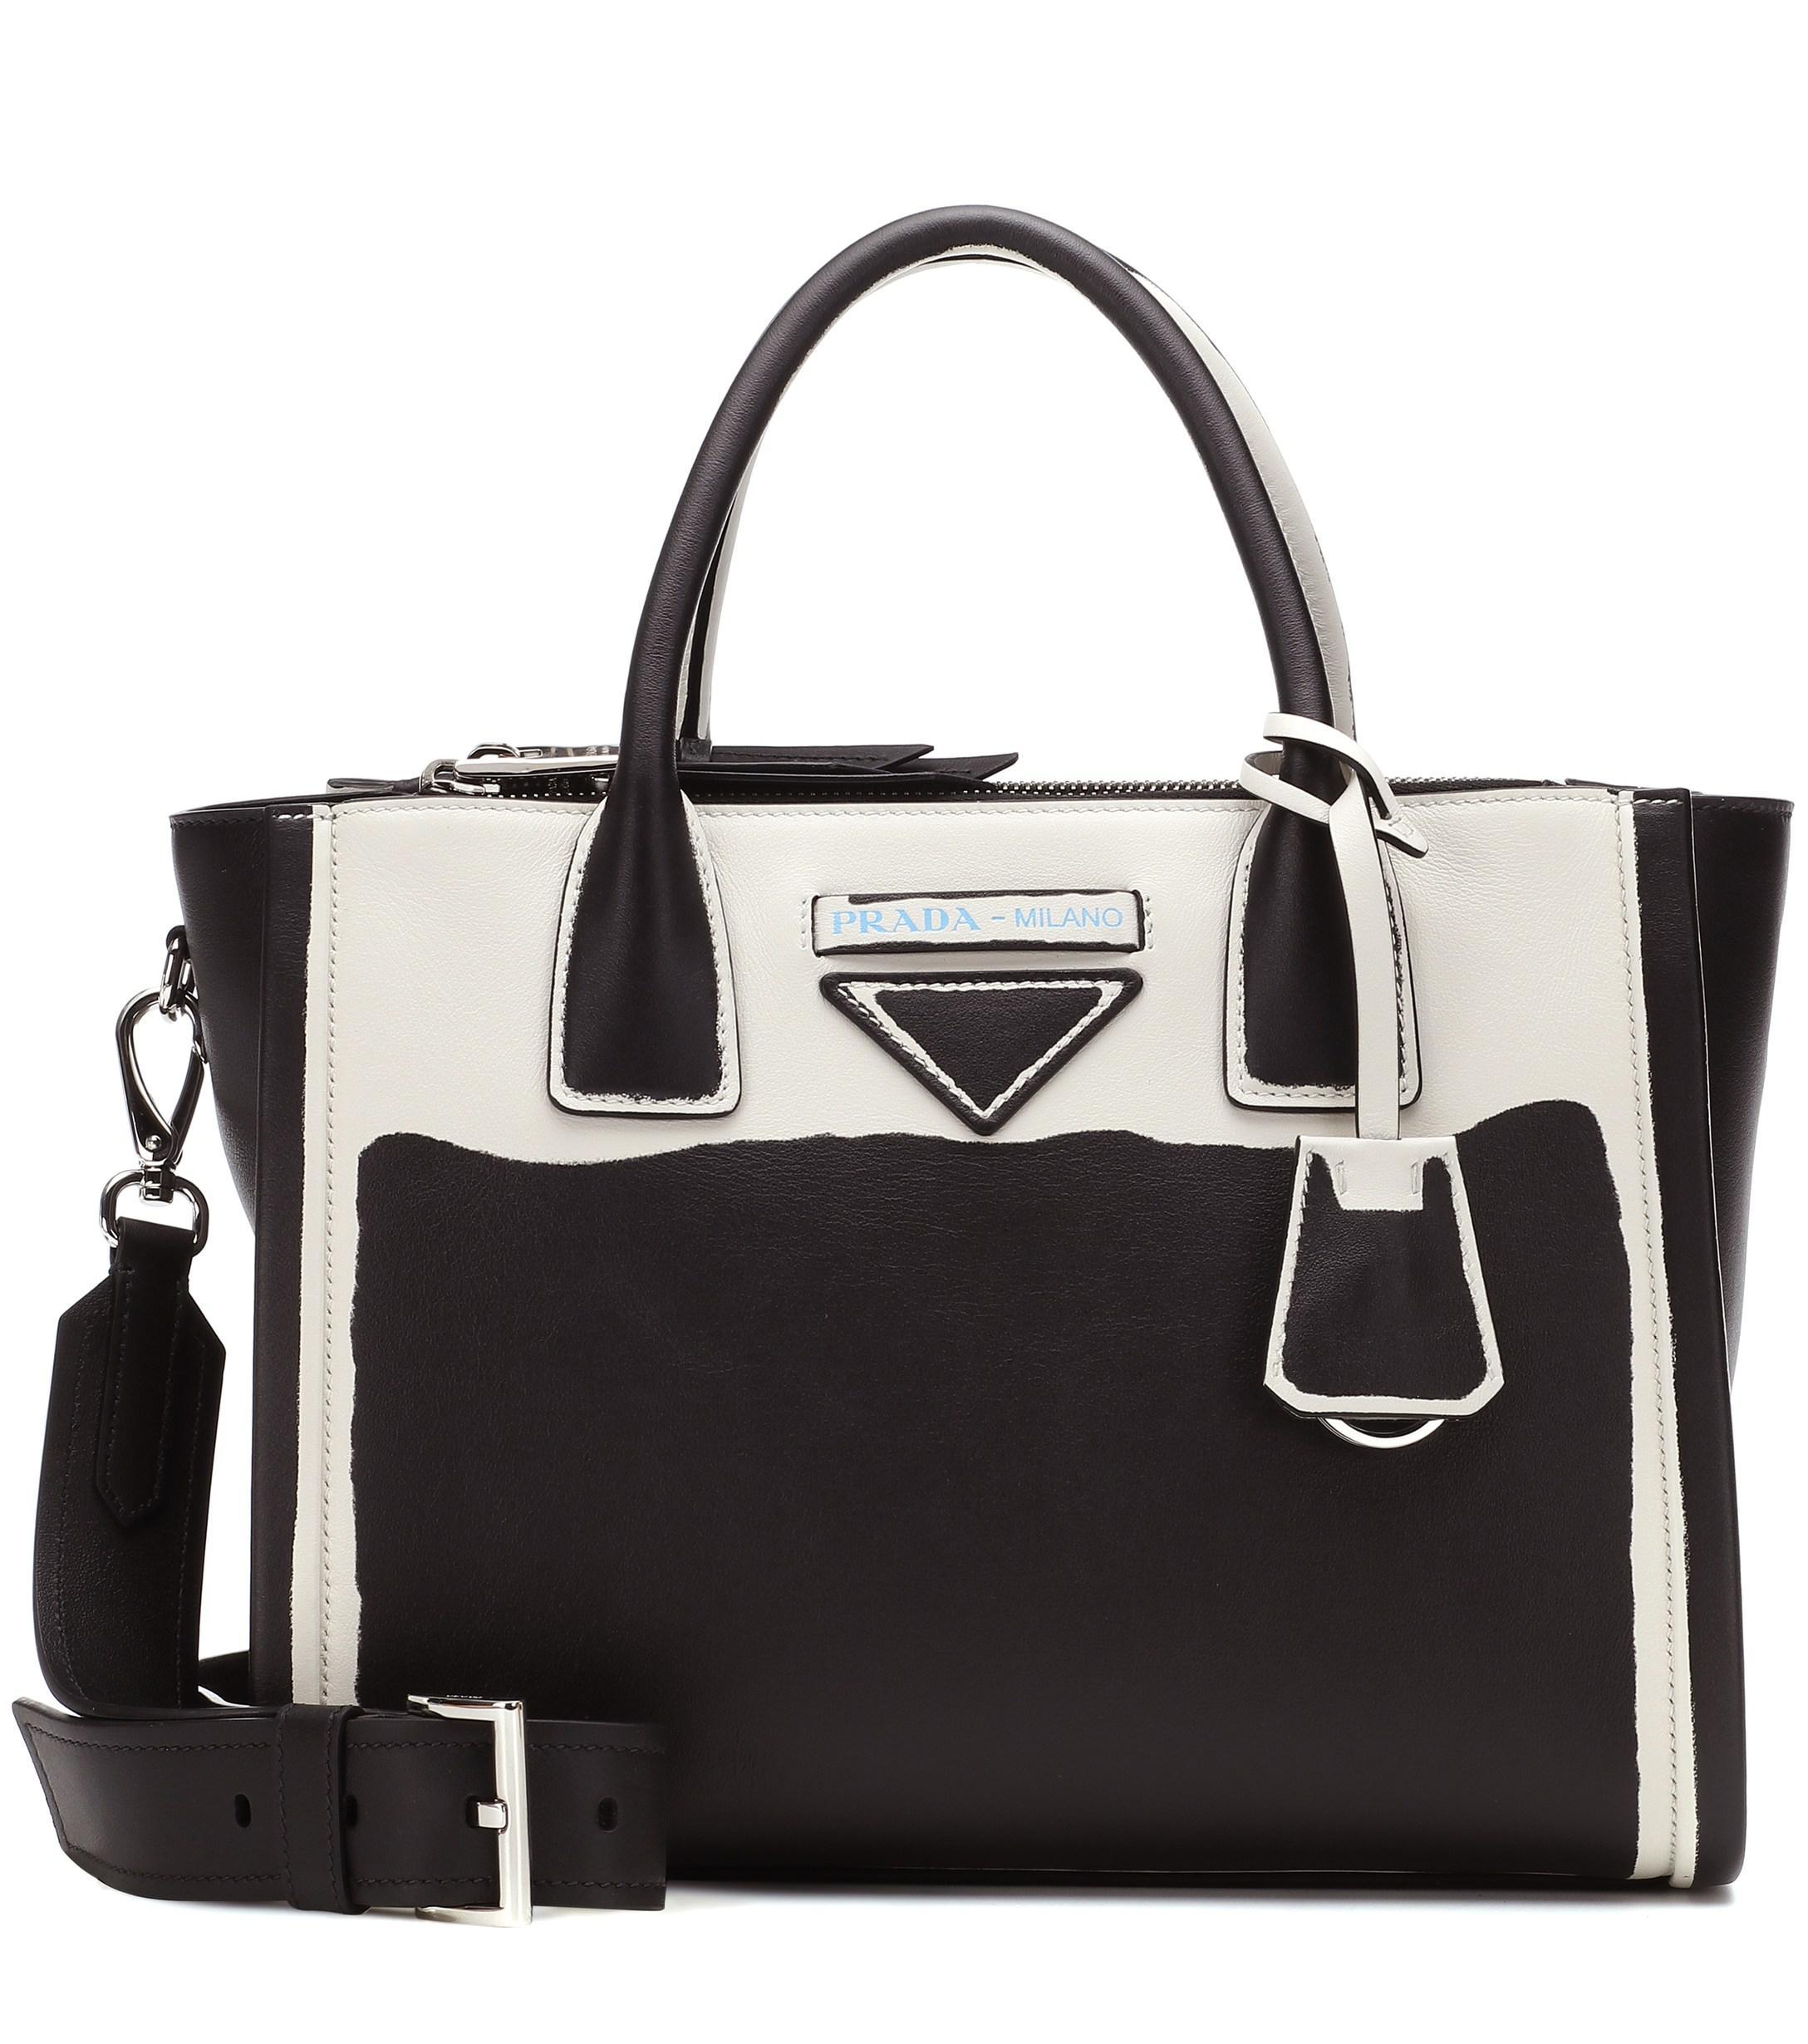 dd42bf7a4adf3b Lyst - Prada Concept Galleria Leather Tote in Black